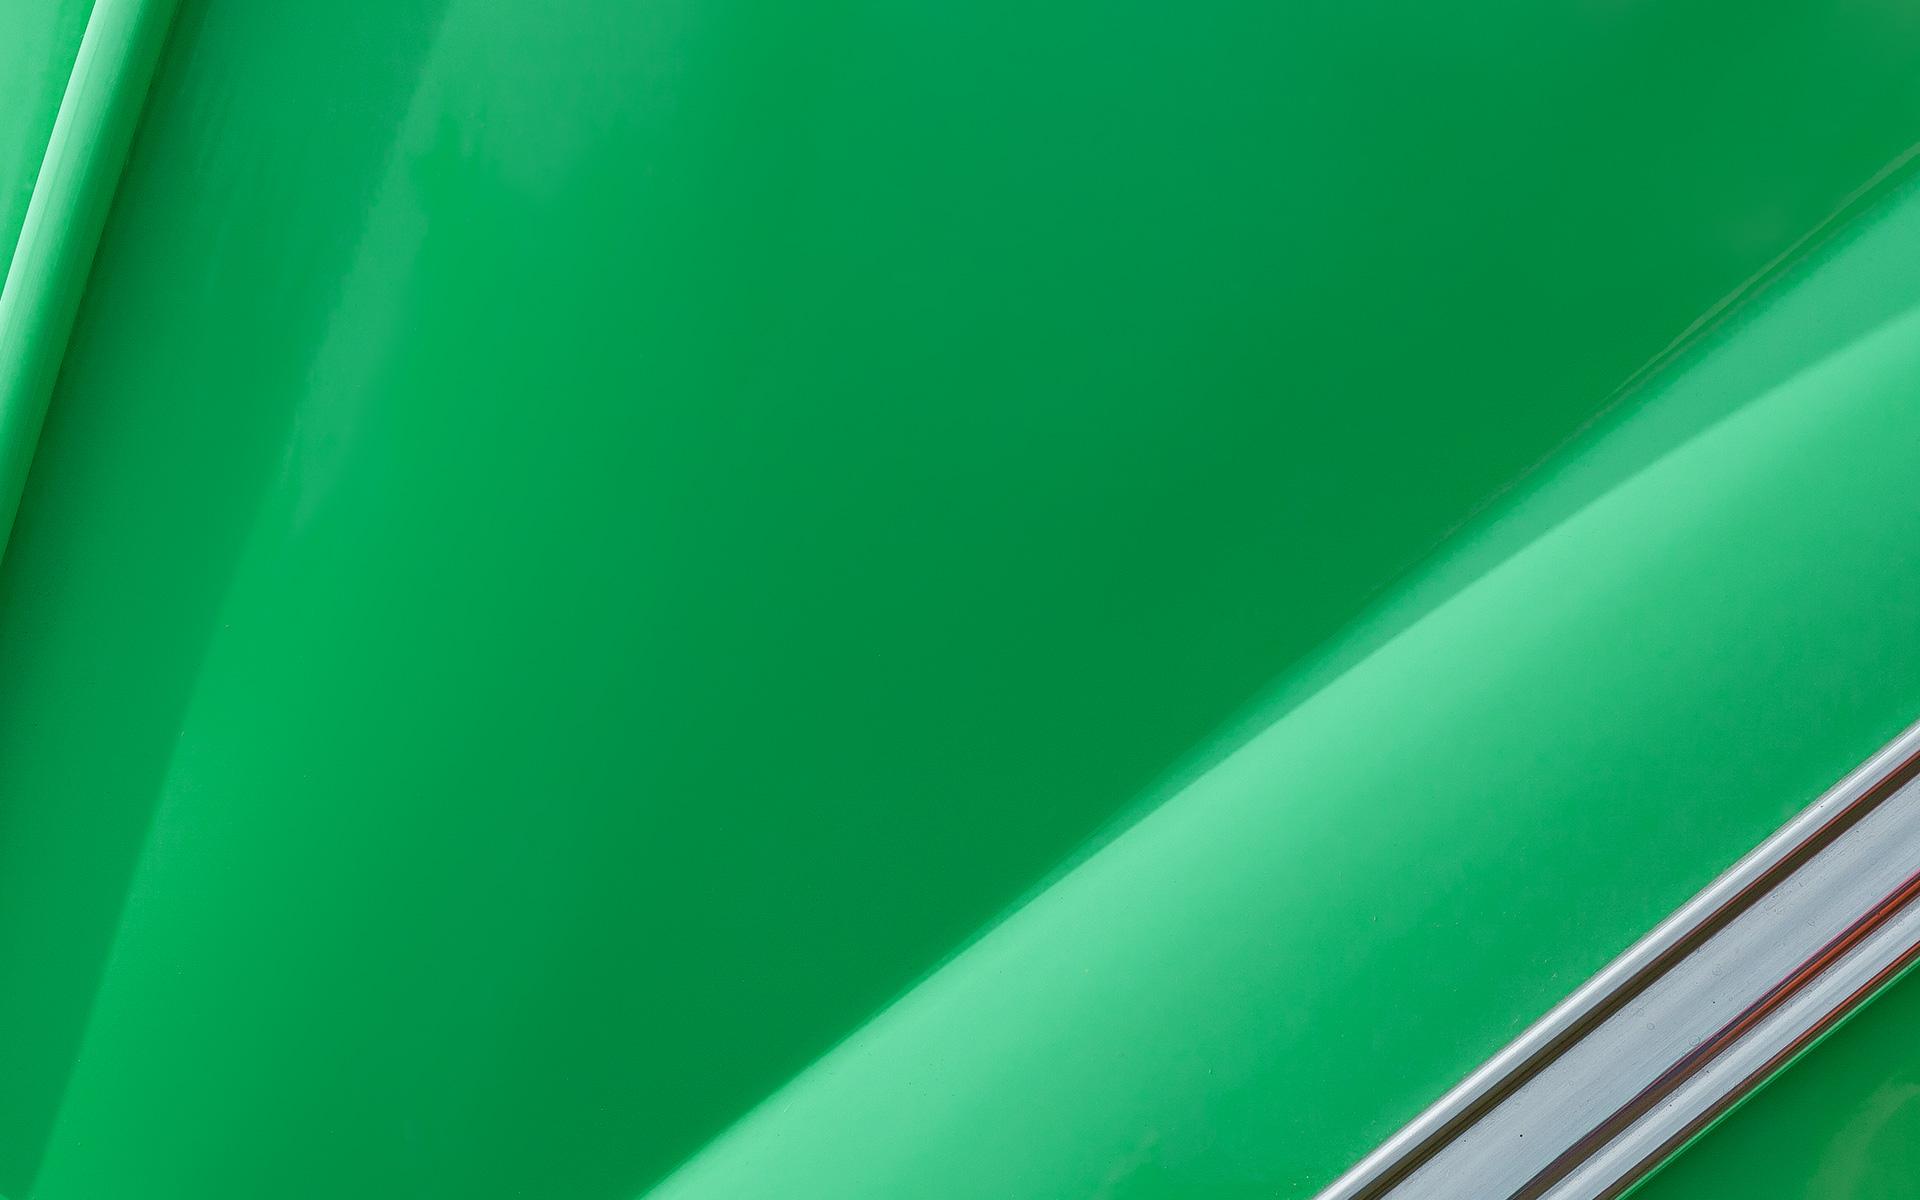 Lines And Colors - Windows 8 Wallpaper Green - HD Wallpaper